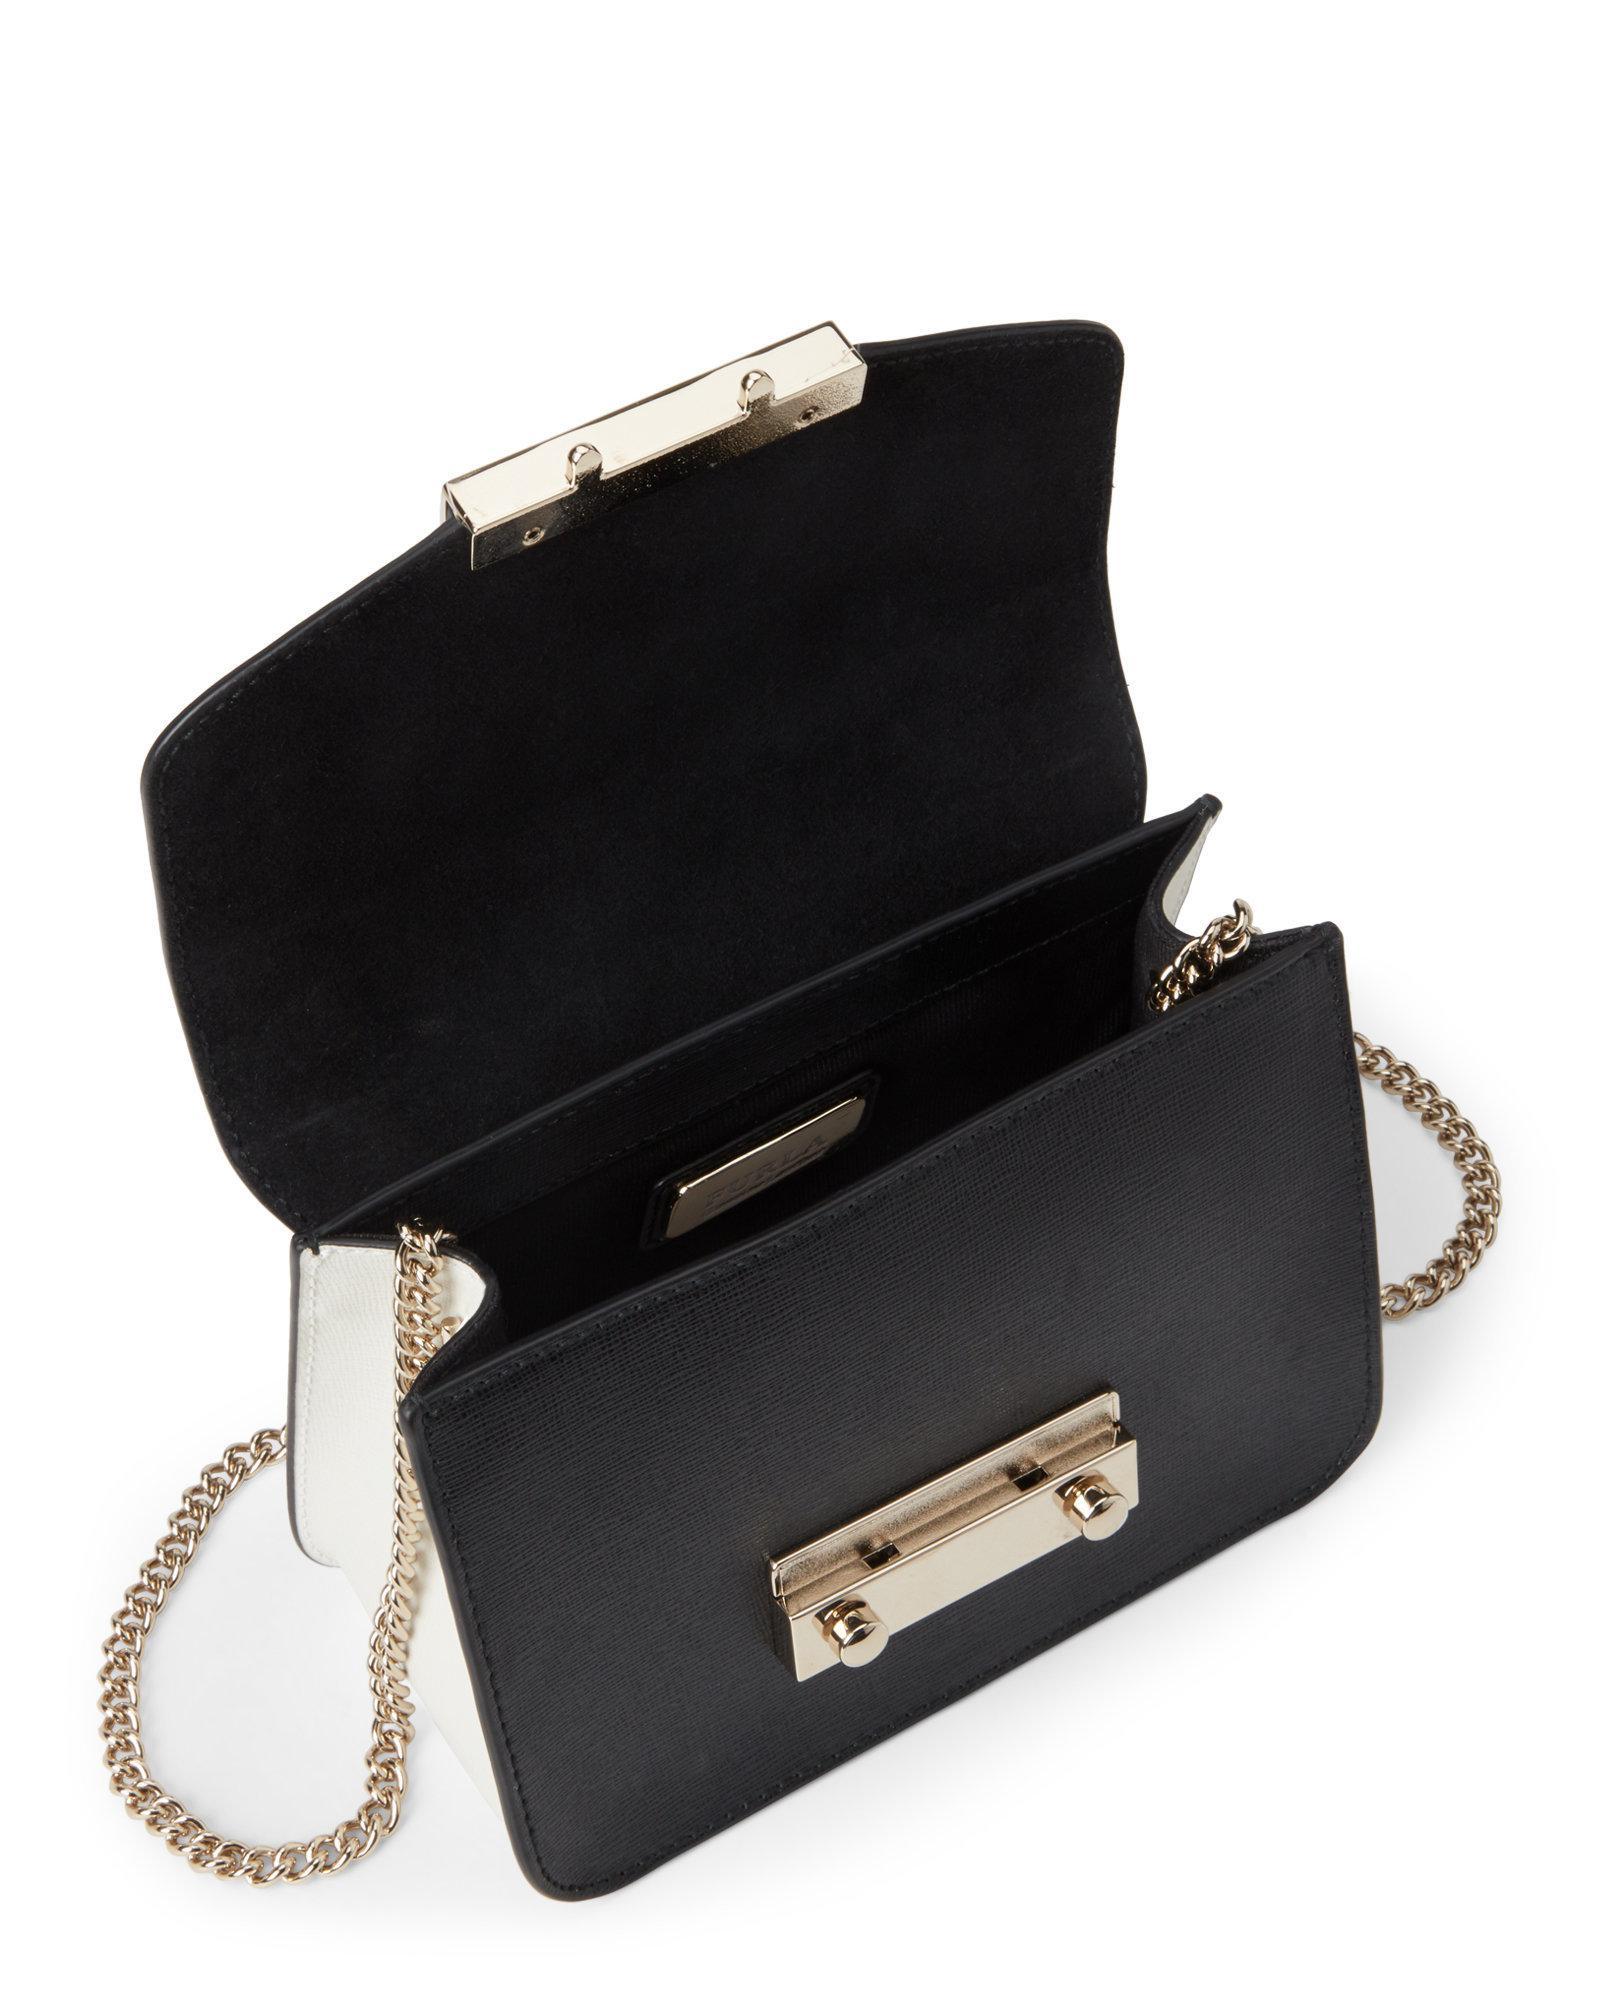 213170a8fb2c Lyst - Furla Julia Saffiano Leather Mini Crossbody in Black